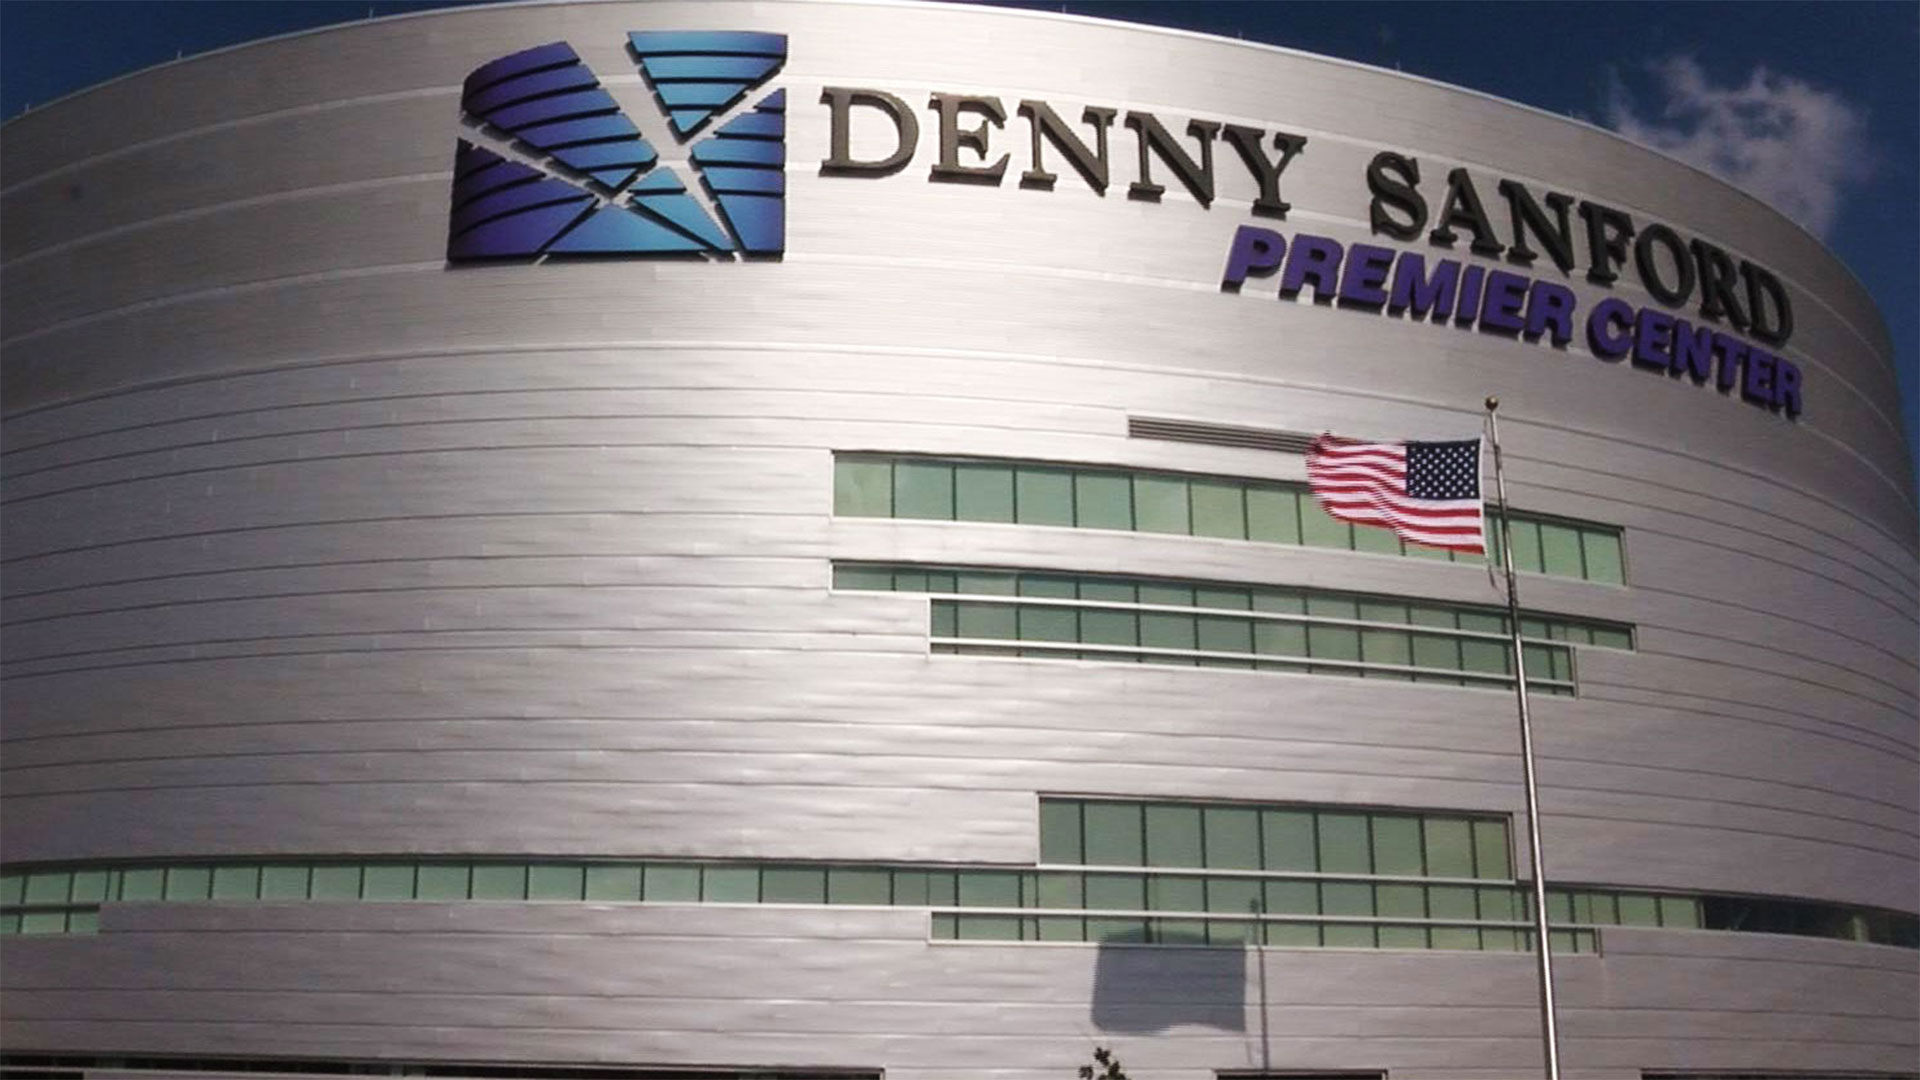 KELO Denny Sanford PREMIER Center